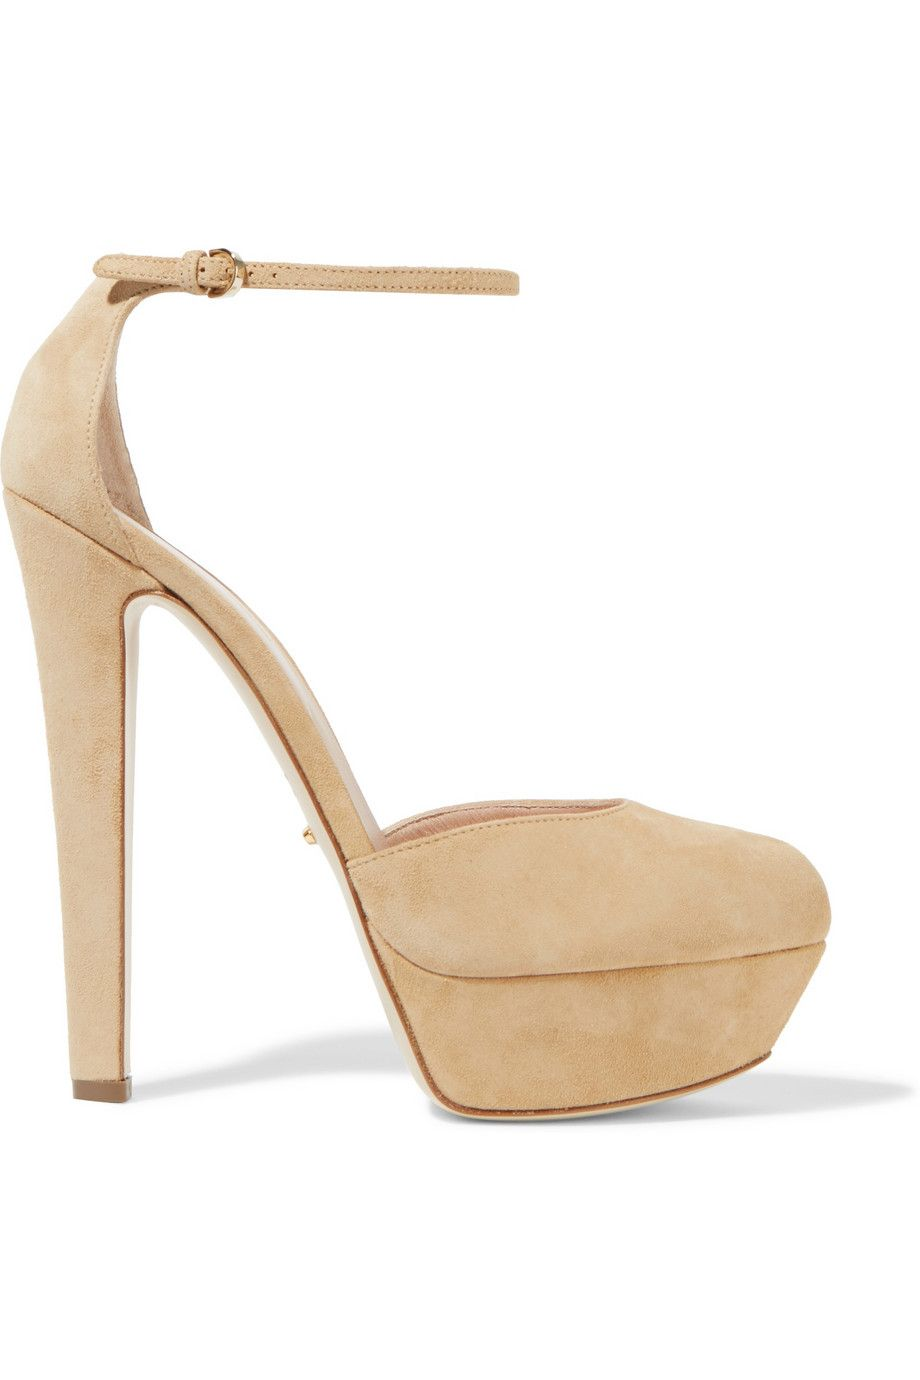 Platform Sandals ankle strap leather beige Sergio Rossi IZaHs